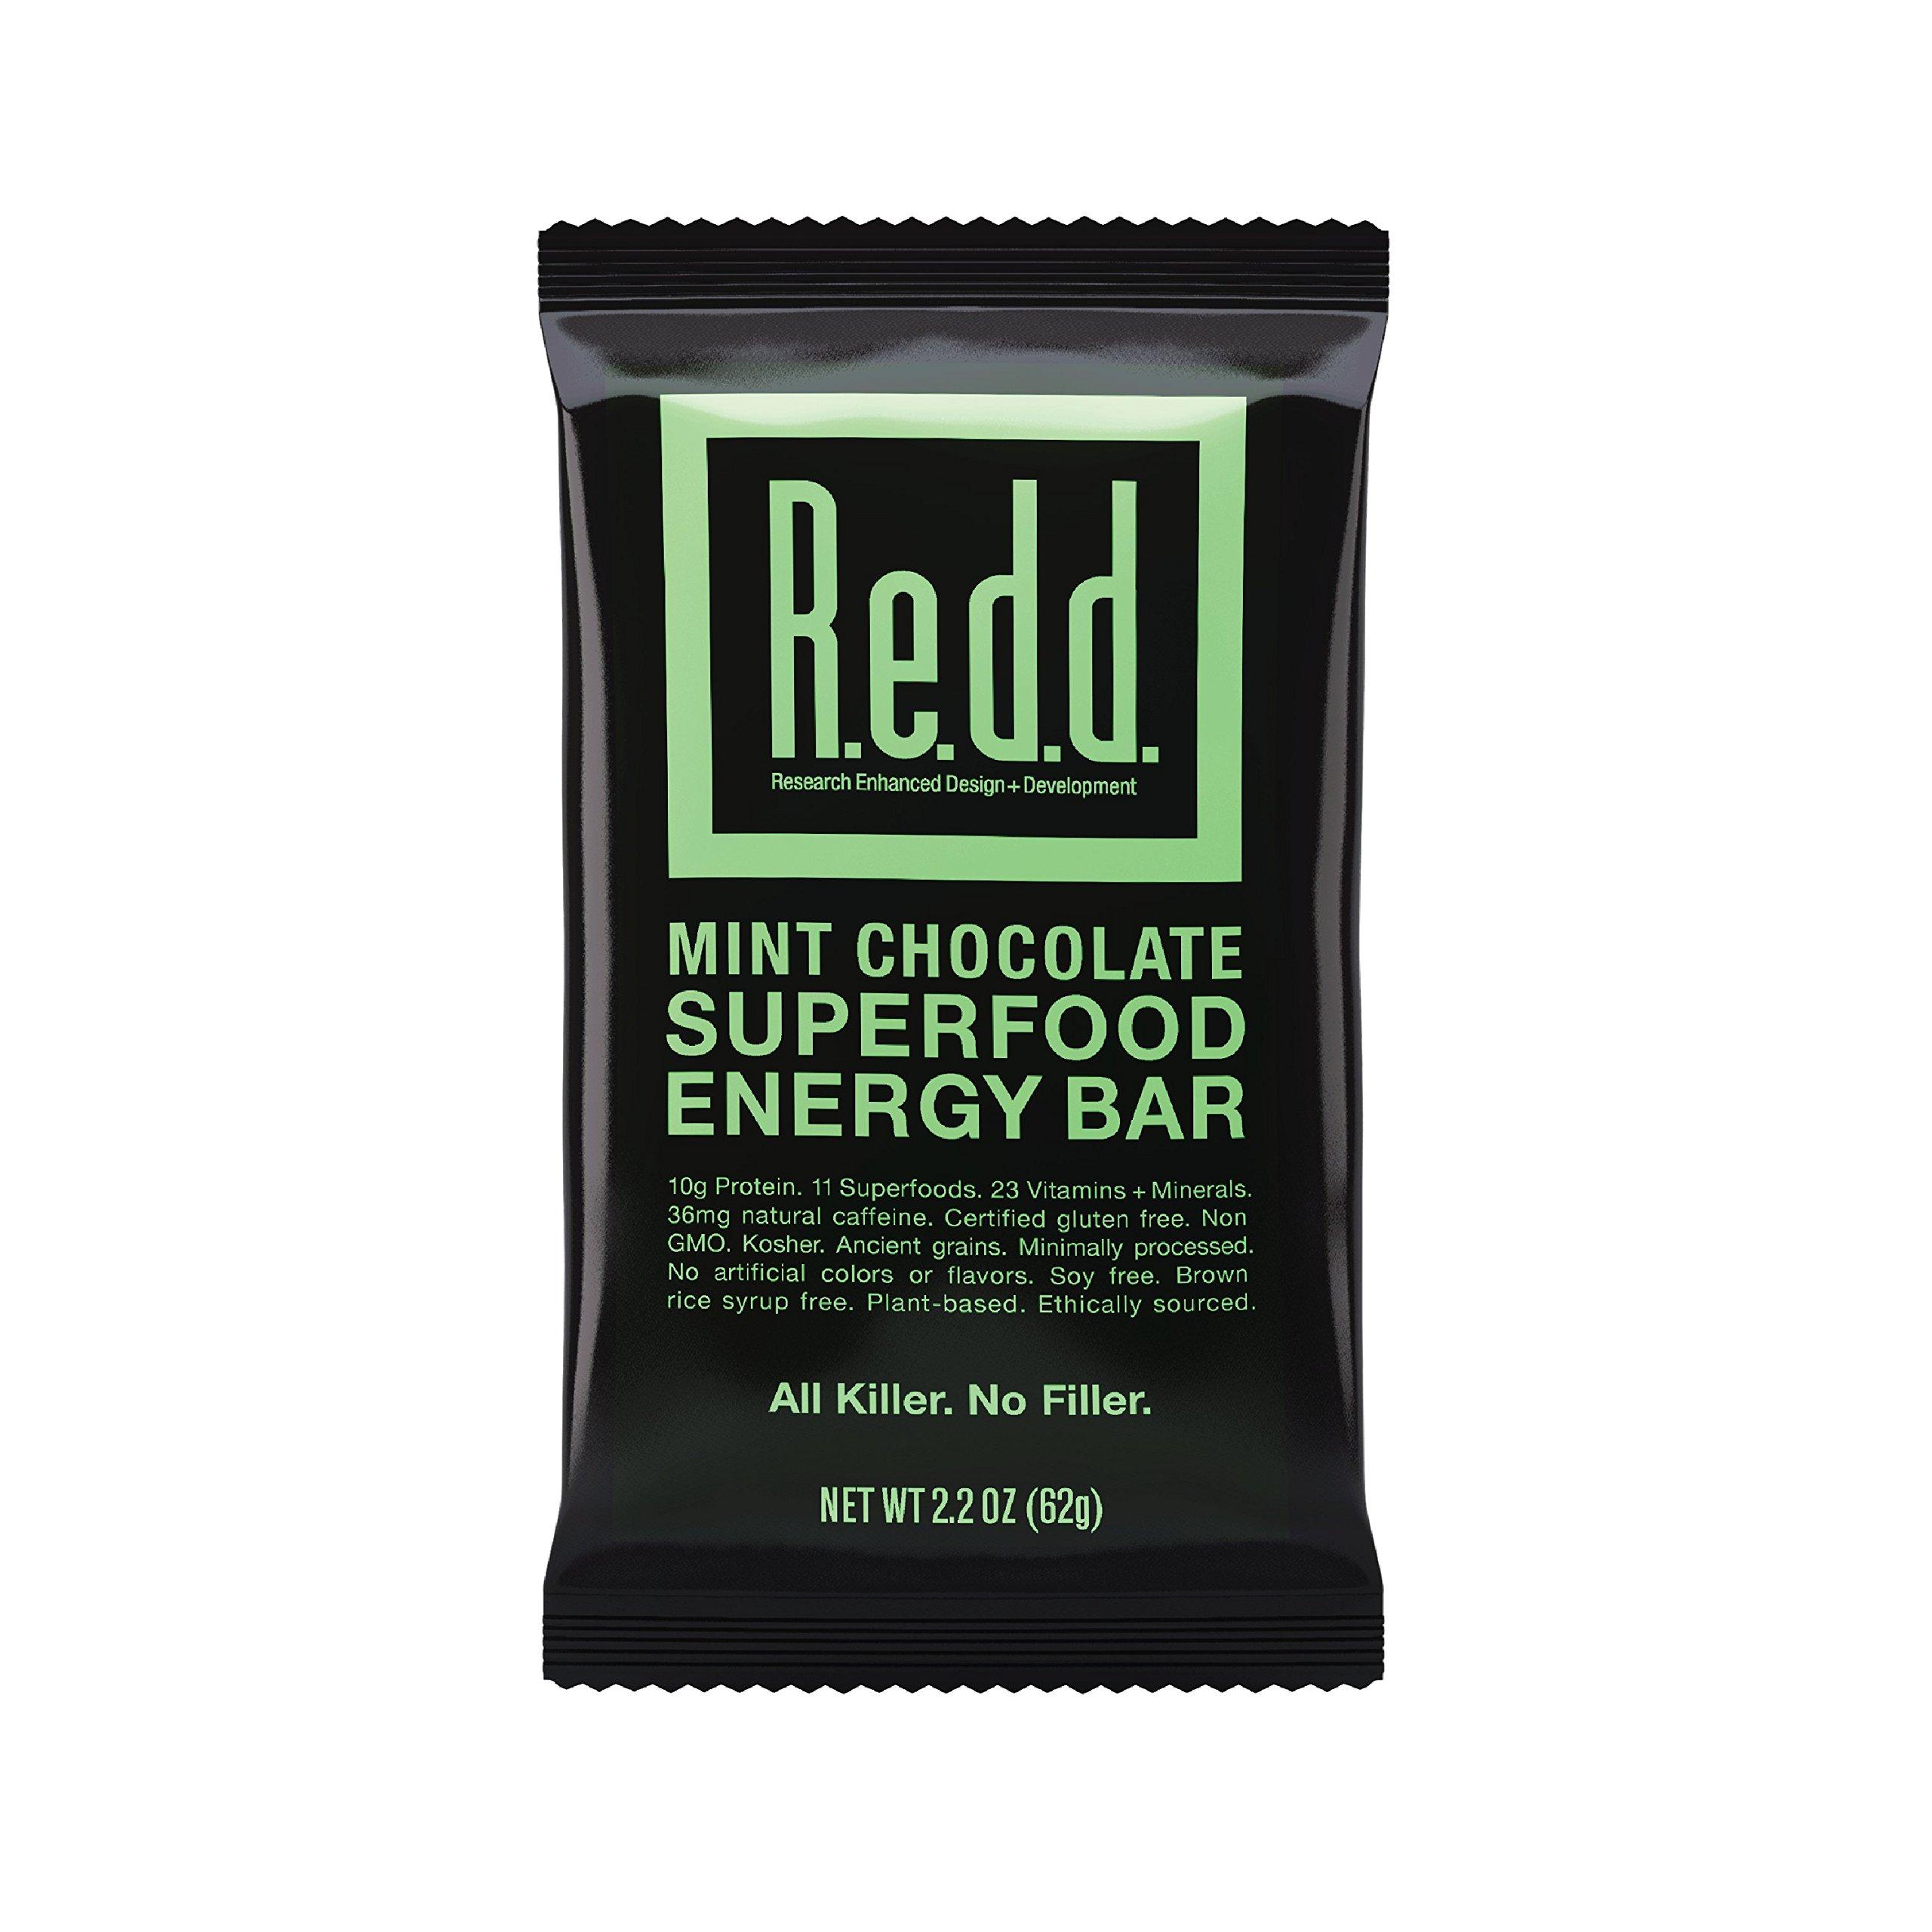 Buy Redd Now!